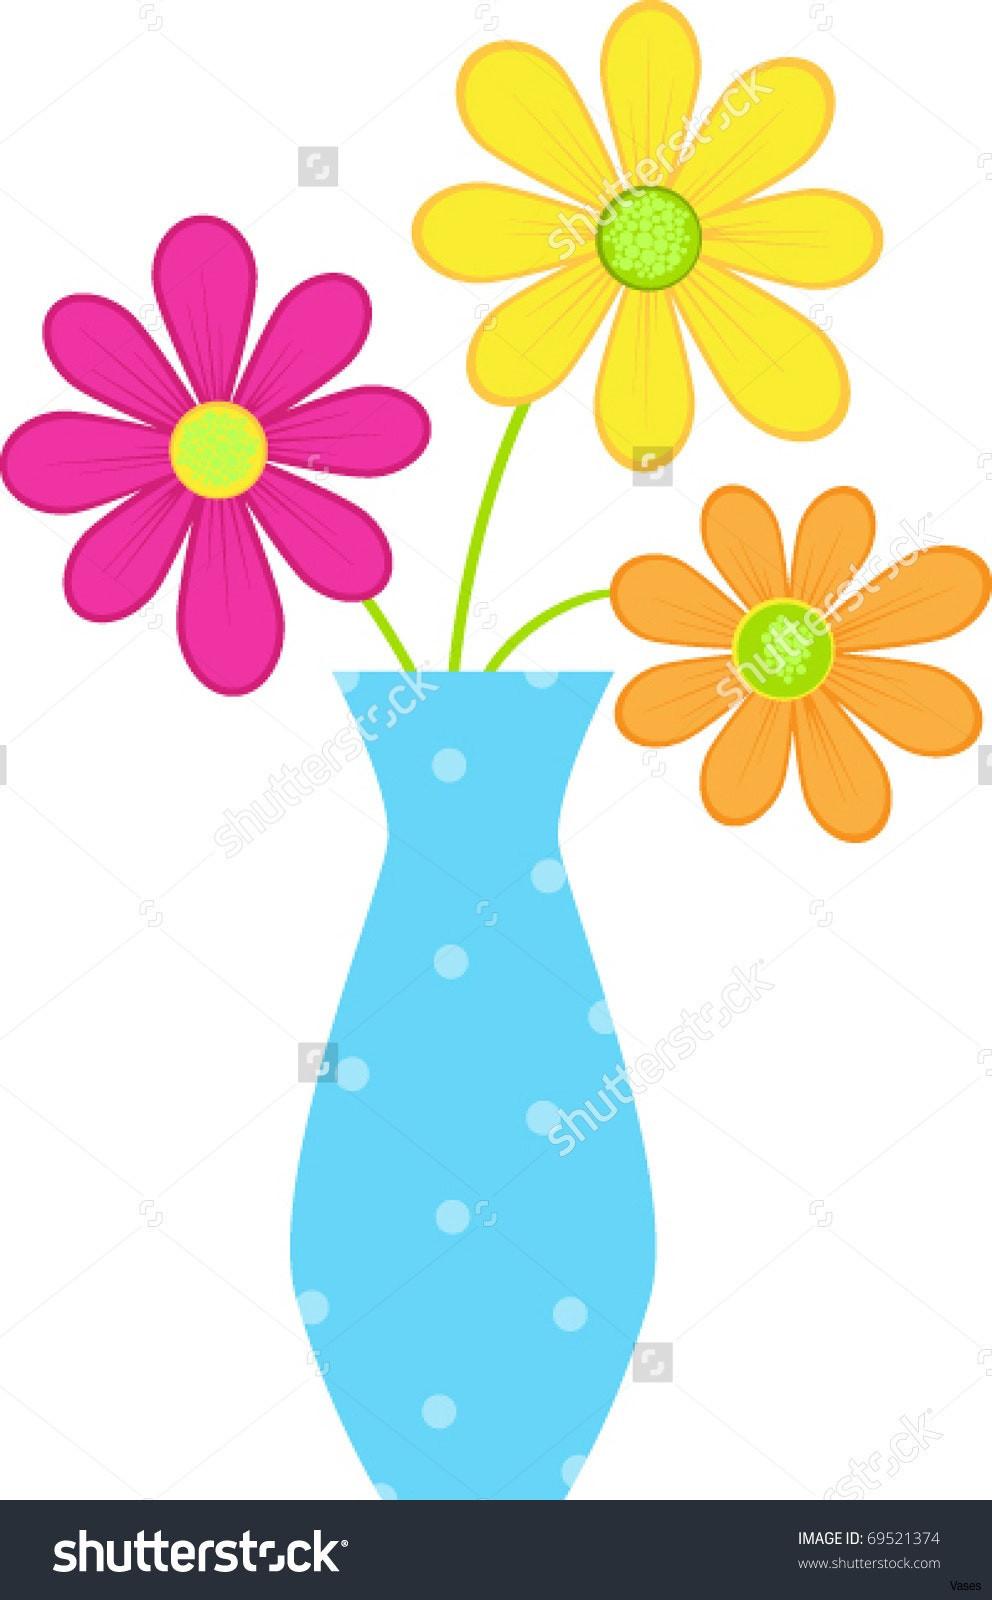 daisies in a vase of clipart flowers elegant g597 17 301 table 20bouquet prop1h vases in clipart flowers new clip art flowers will clipart colored flower vase clip arth vases